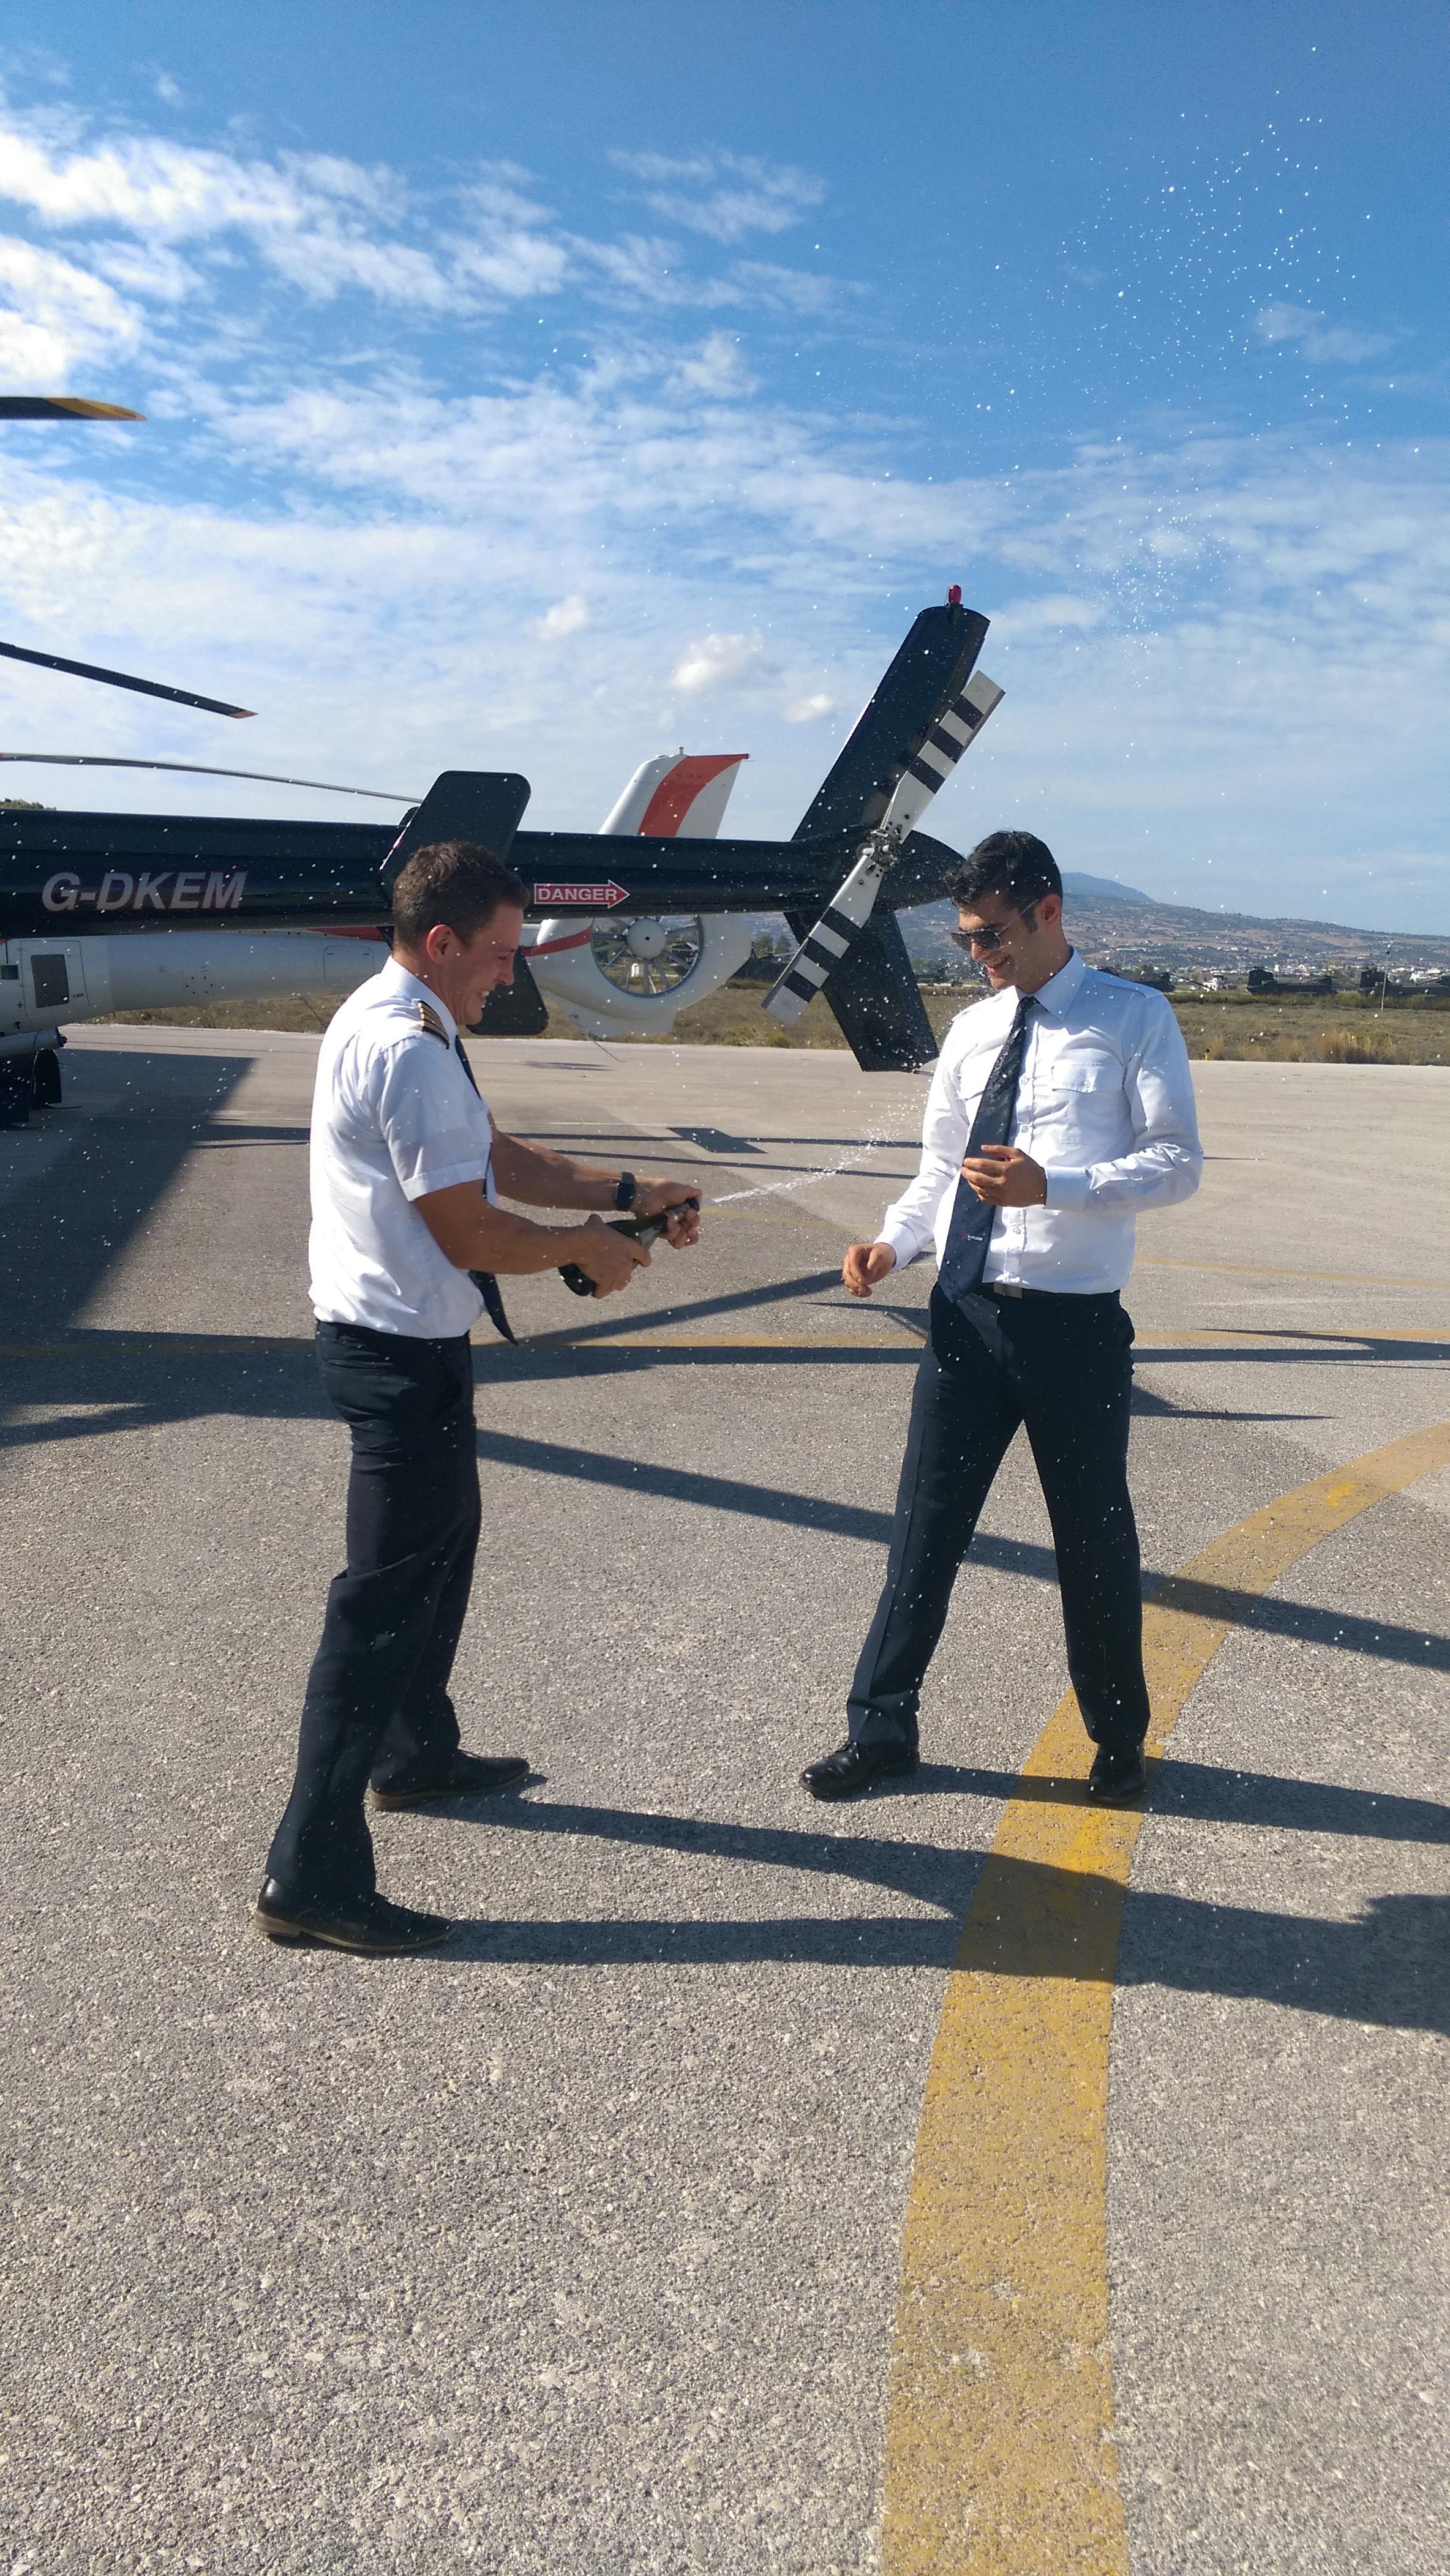 Mr. Chamogeorgakis Matthew first solo flight!